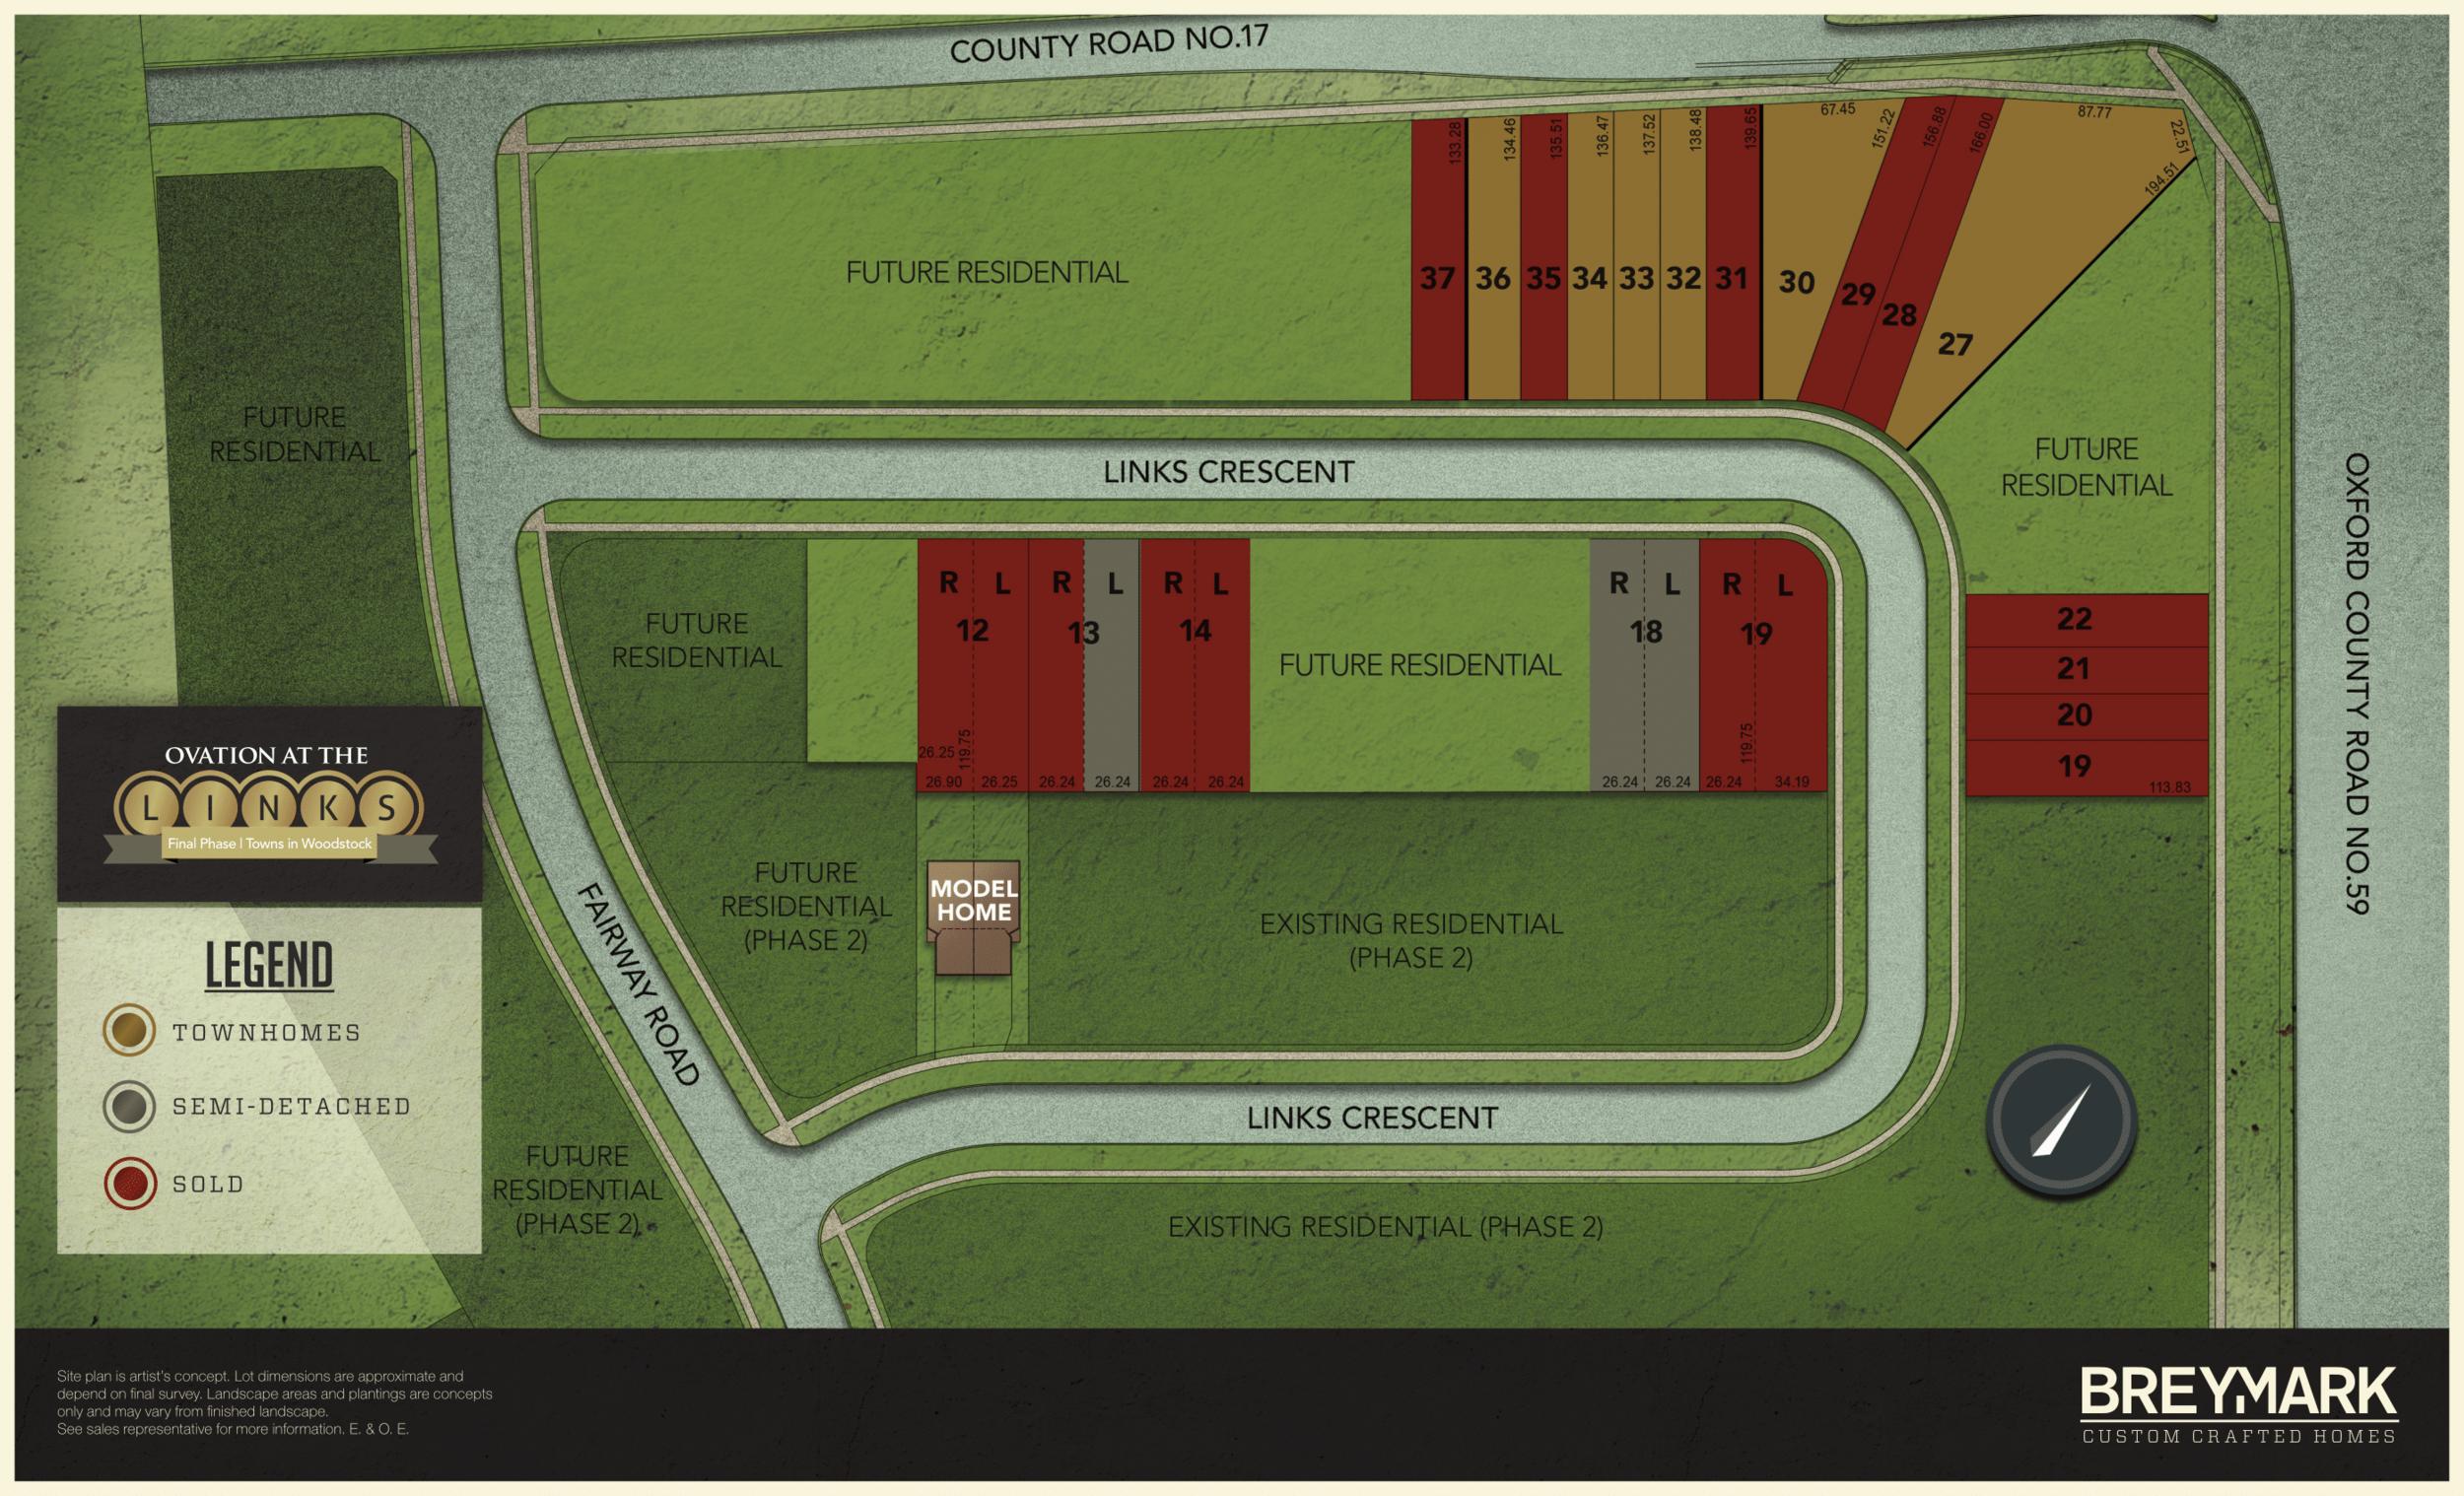 Updated Site Plan - Breymark - Dec 11 2018-1 -PNG.png